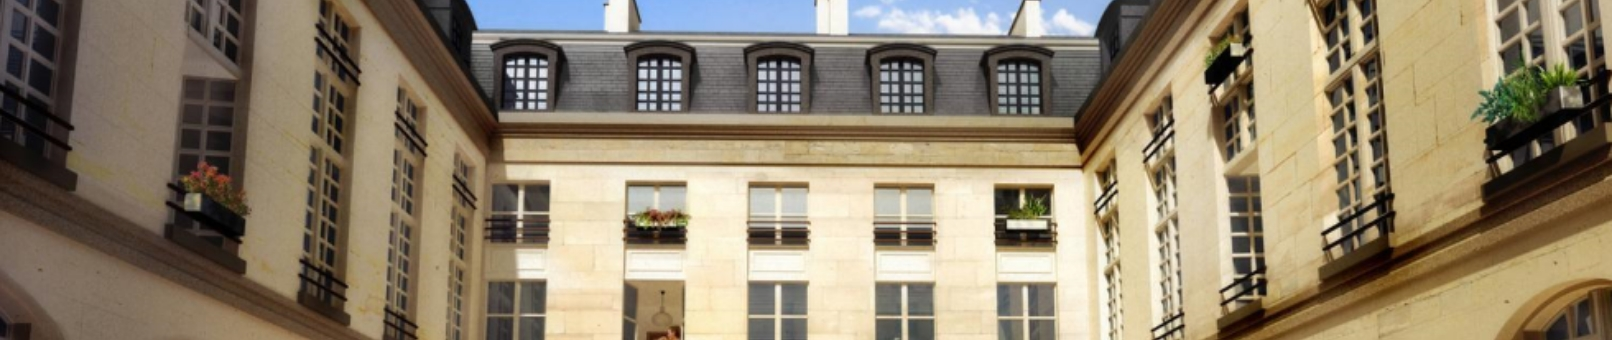 immeuble facade format horizontal loi malraux investissement immobilier